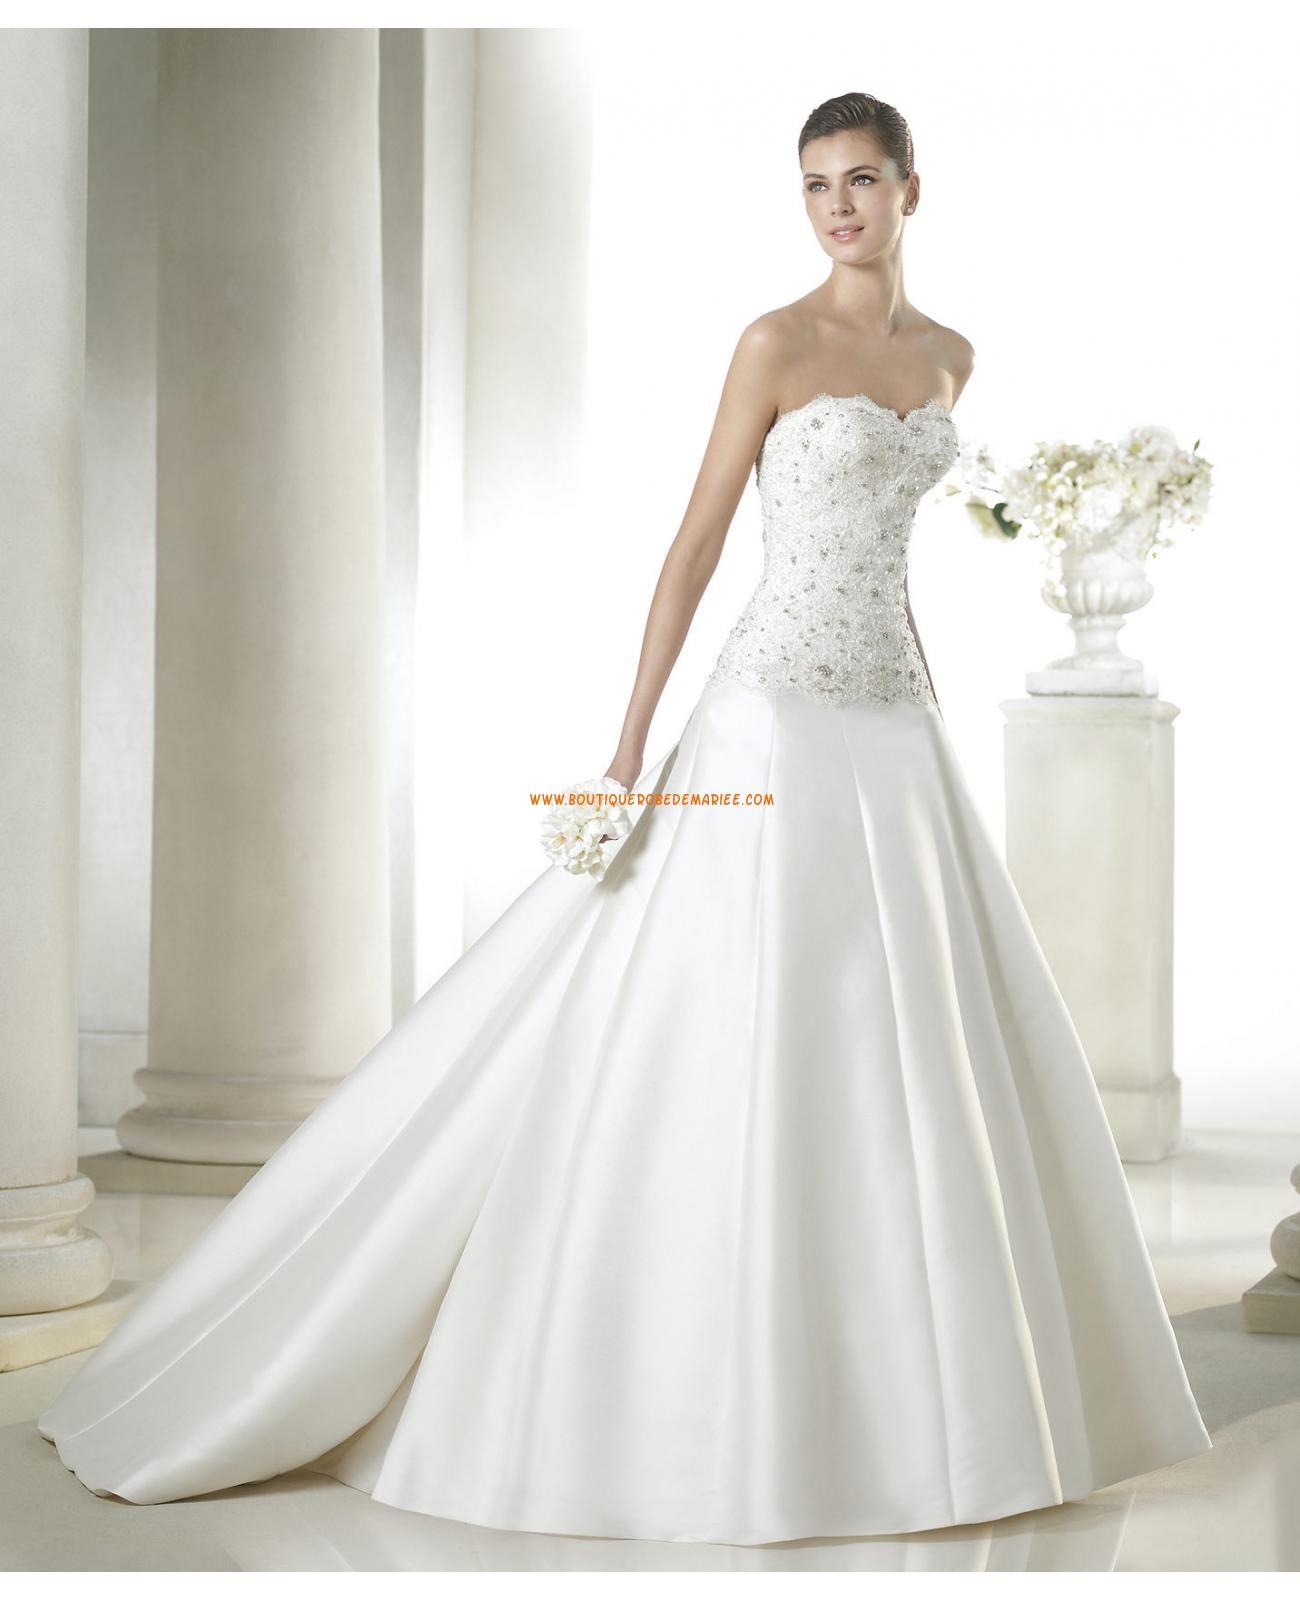 robe de mari e avec bustier dentelle perl 2015 robes mariage pinterest dentelle perl e. Black Bedroom Furniture Sets. Home Design Ideas